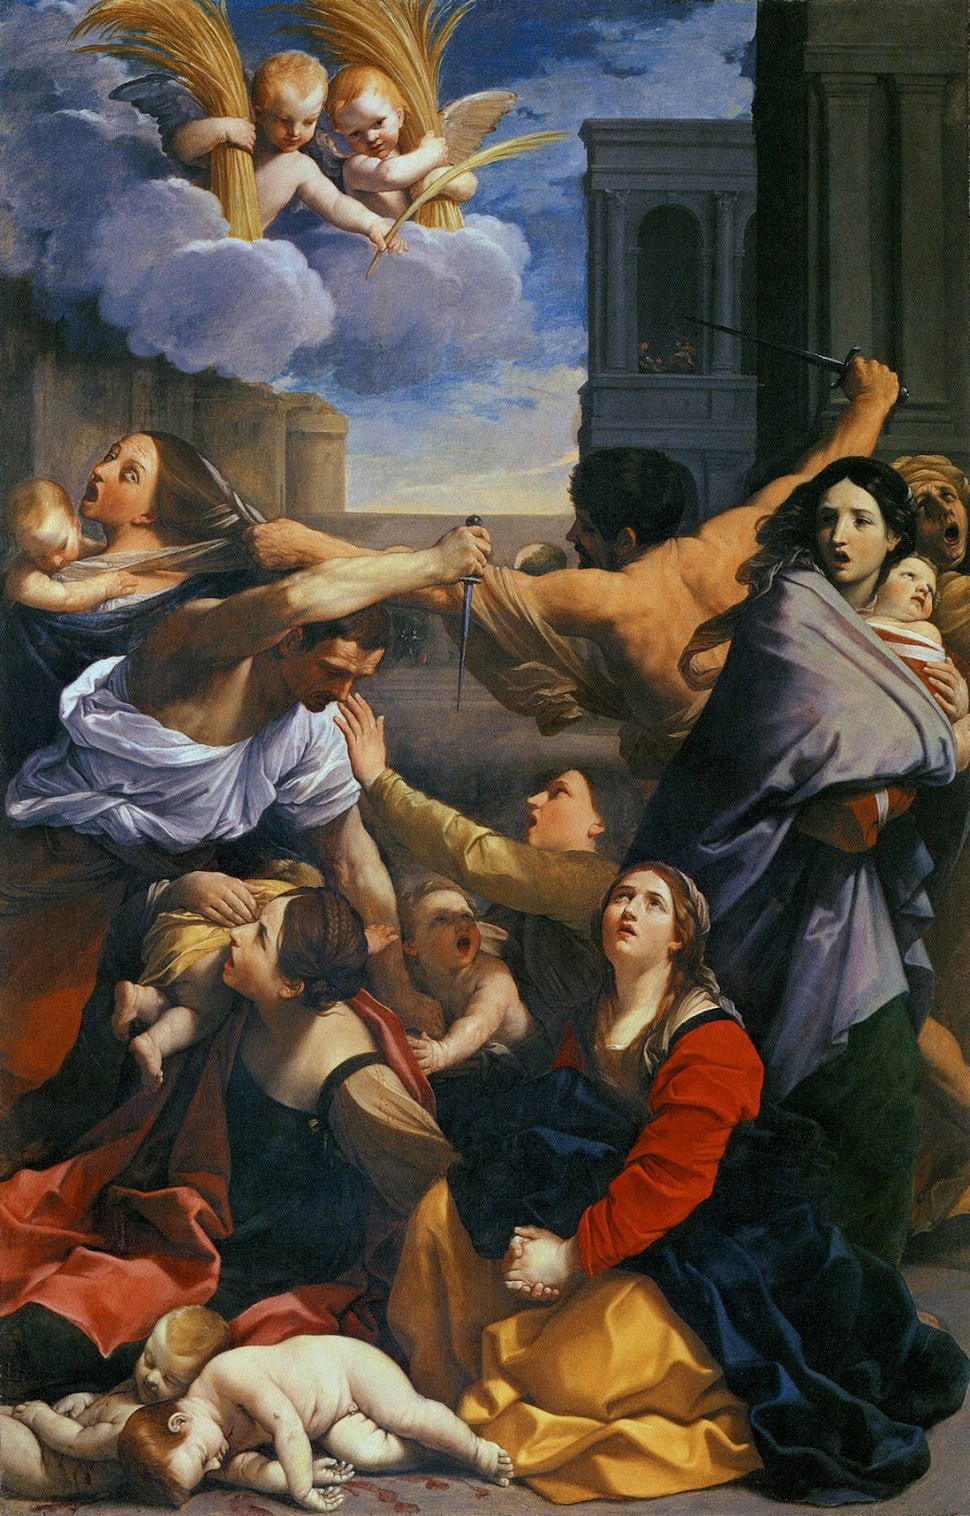 Guido Reni - Massacre of the Innocents